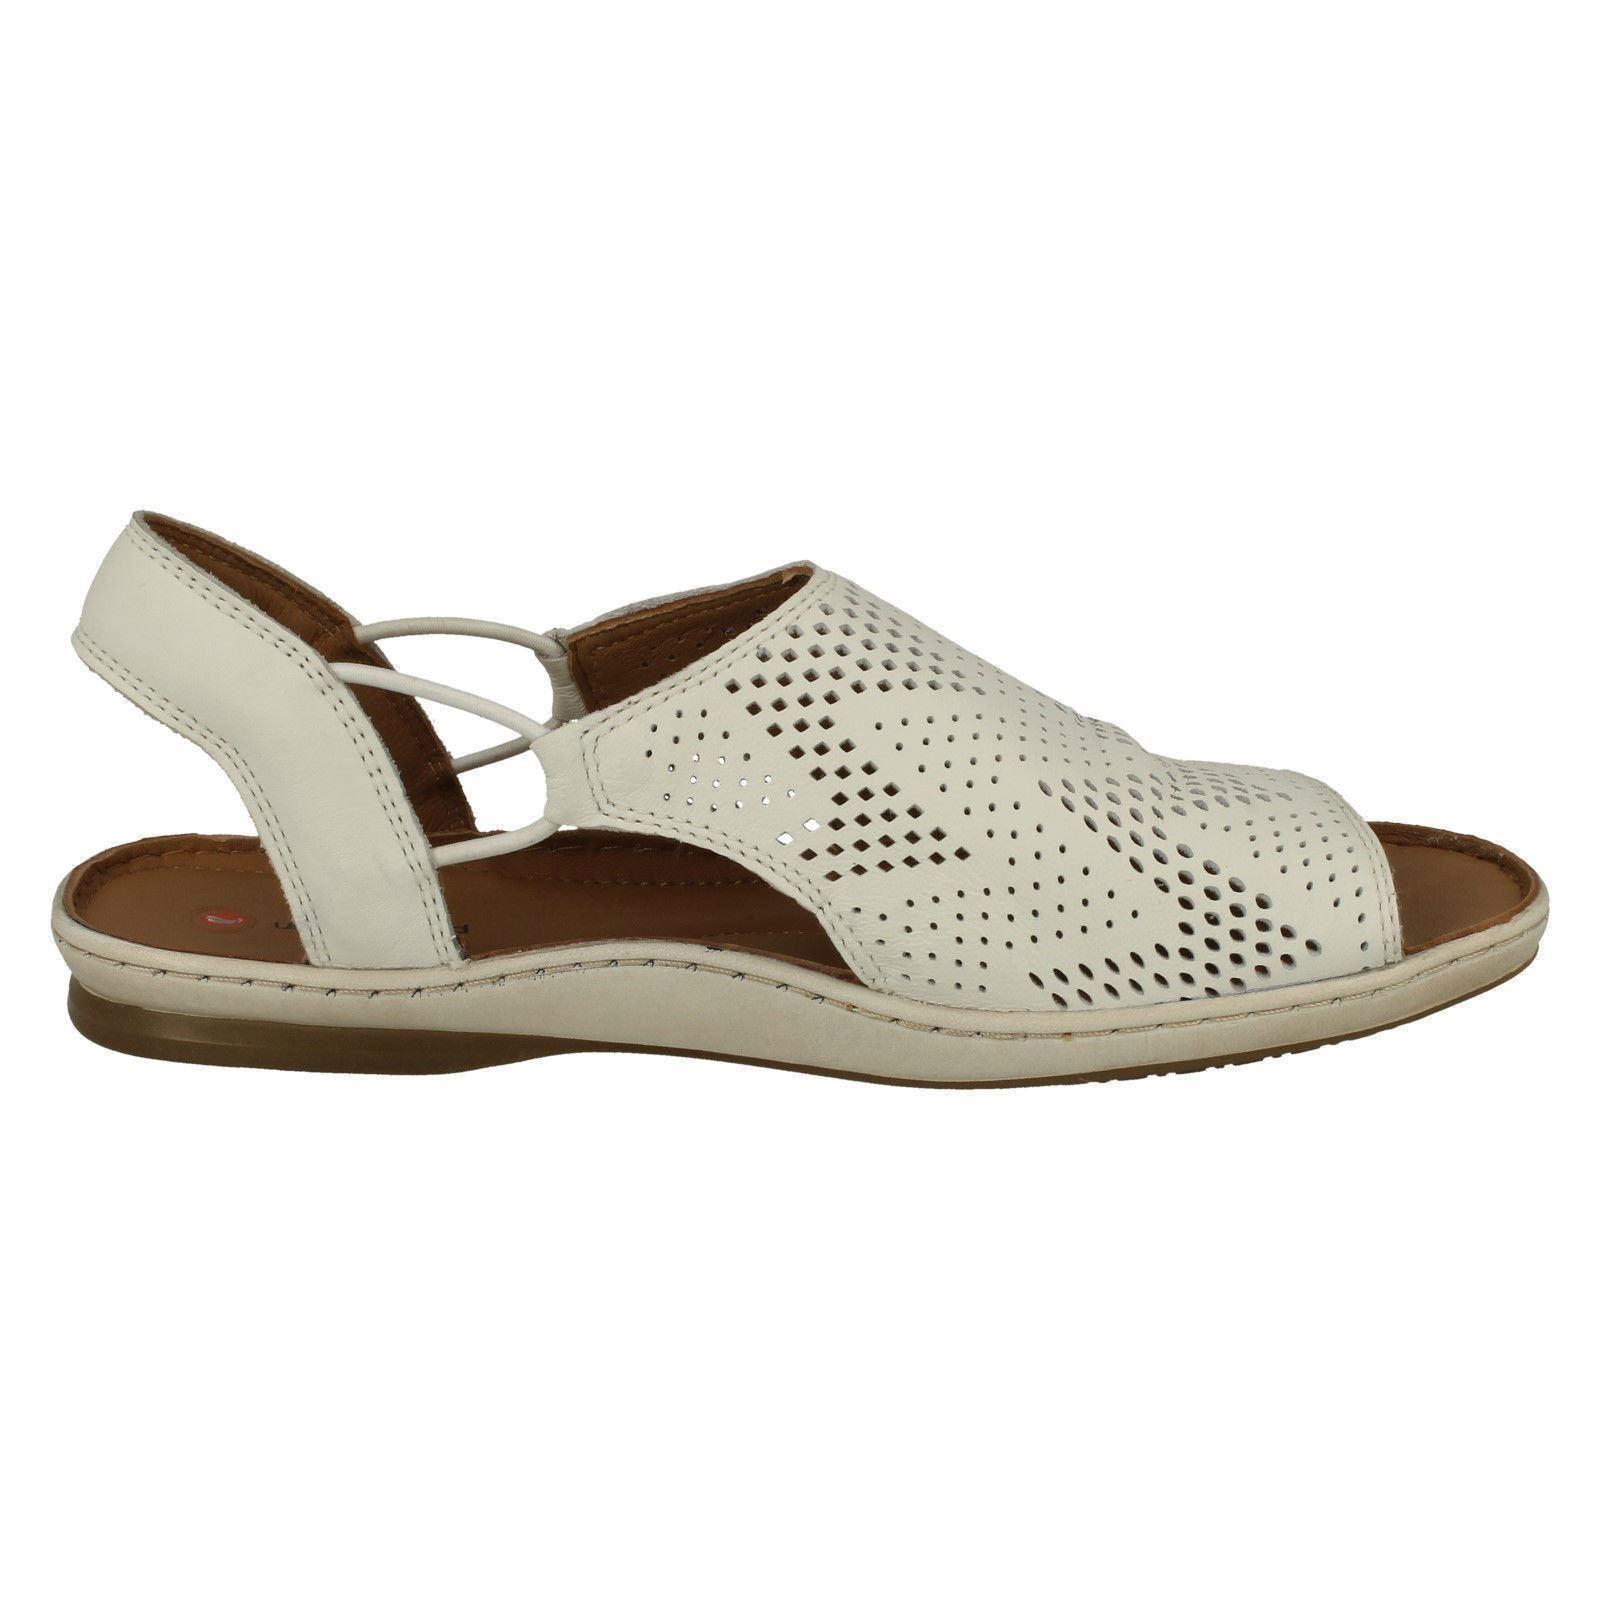 Ladies Clarks Slip On Flat Sandals /'Sarla Cadence/'